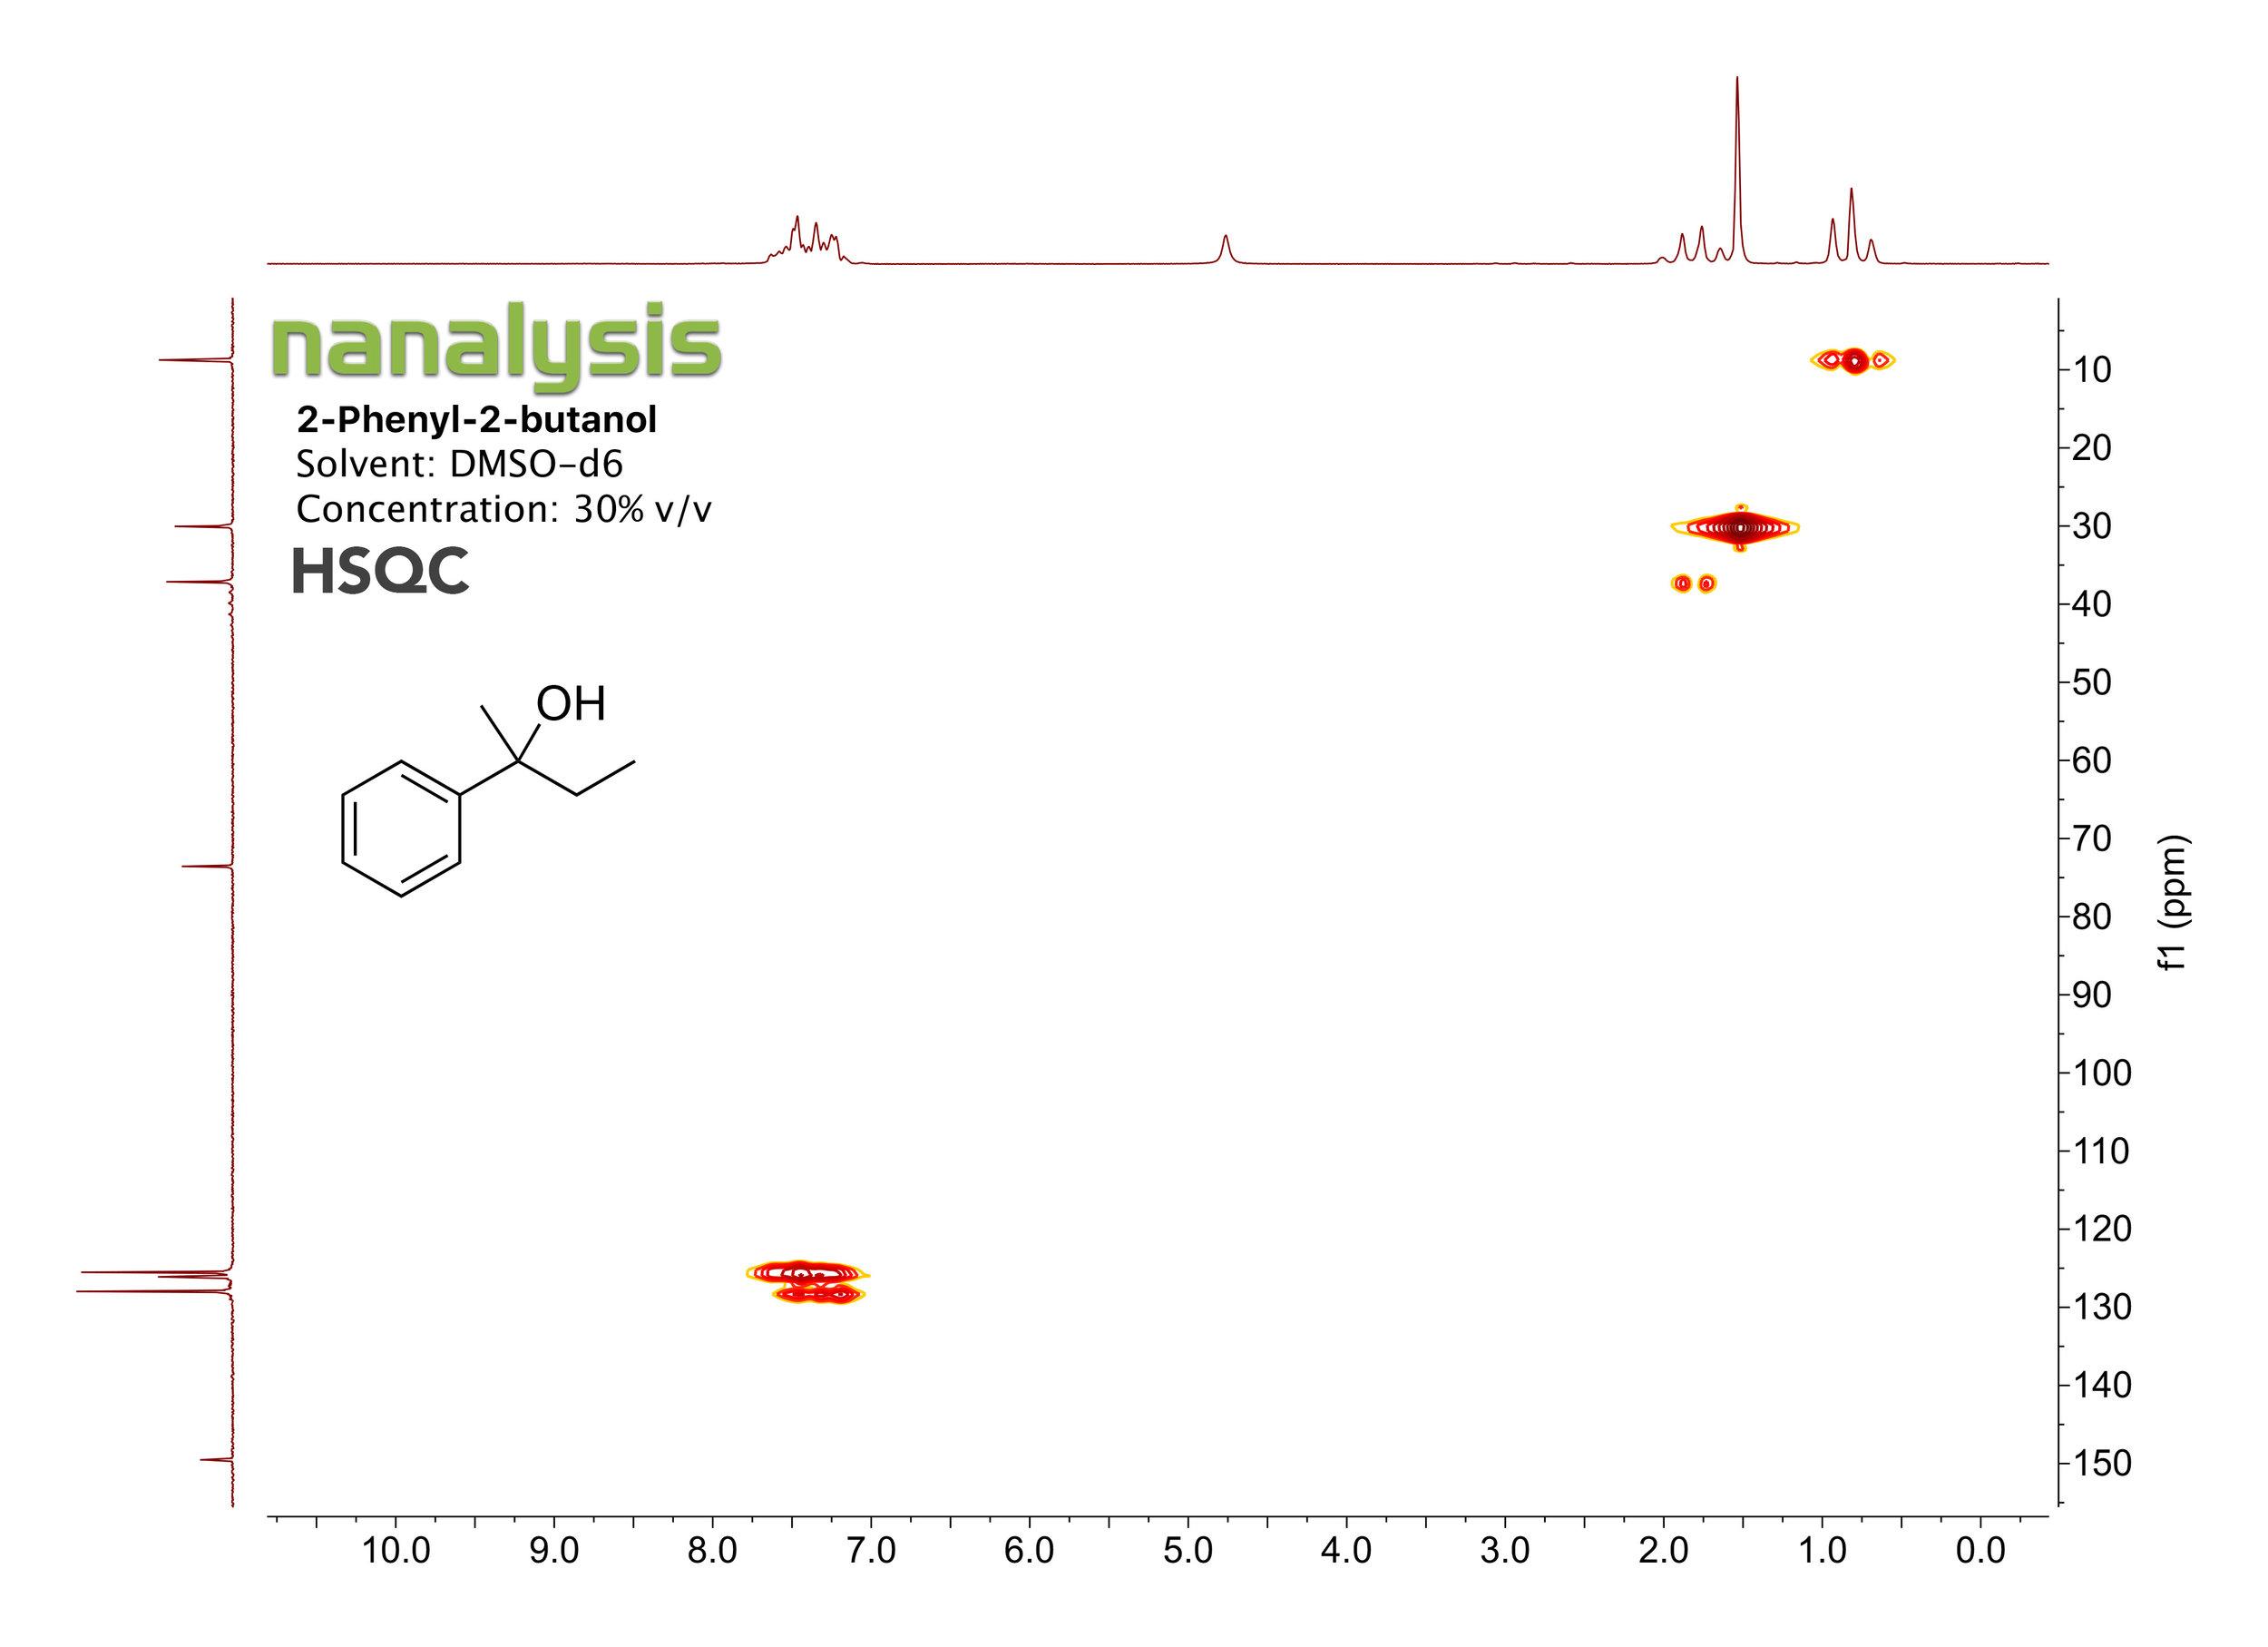 hsqc-benchtop-nmr-2-phenyl-2-butanol.jpg